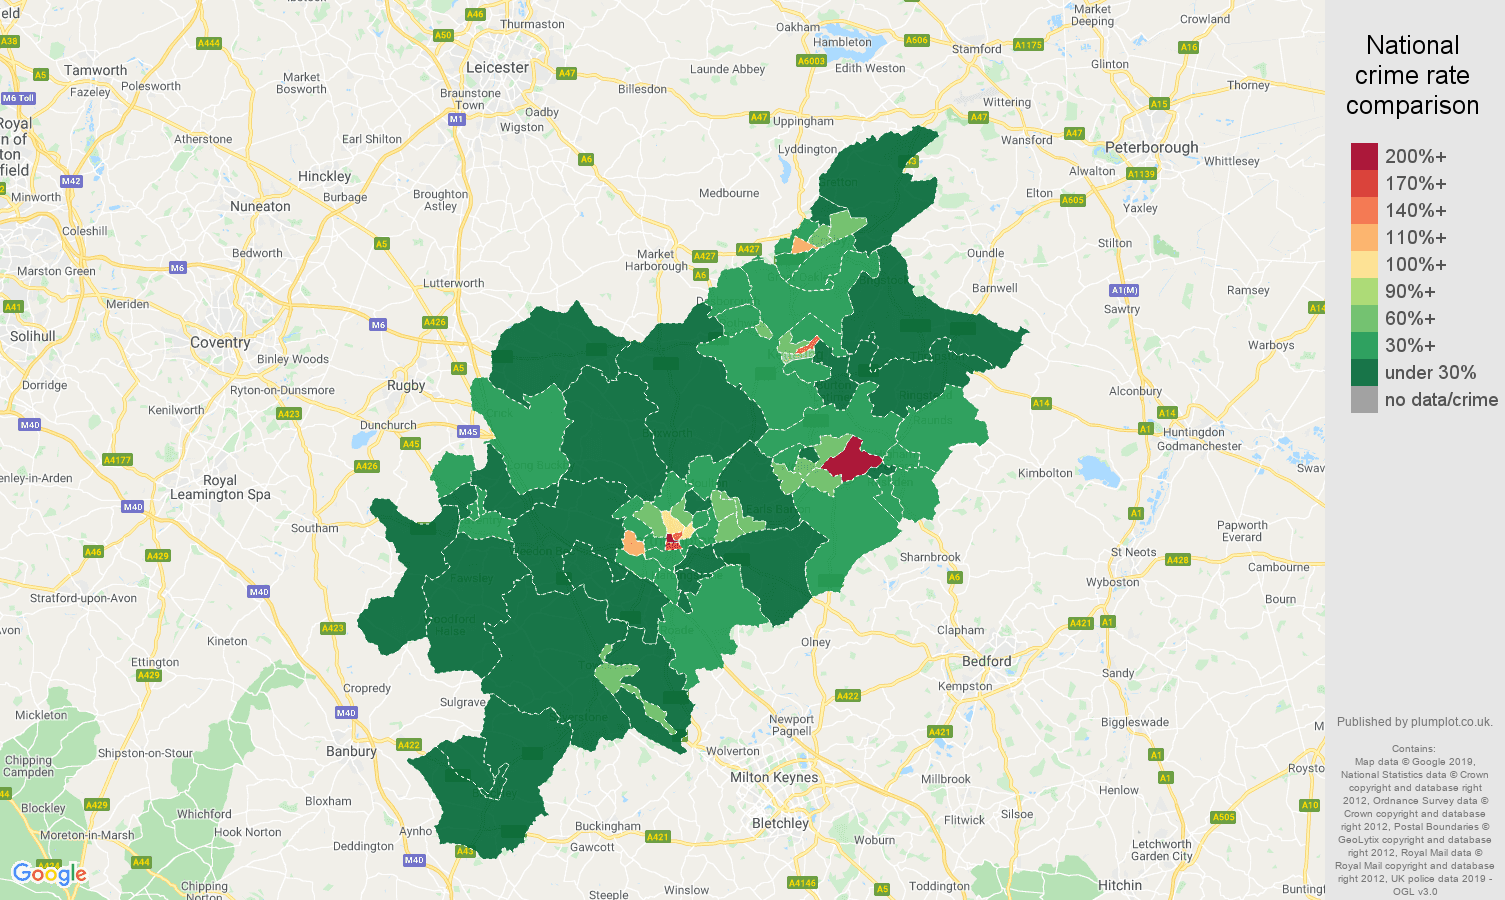 Northampton public order crime rate comparison map